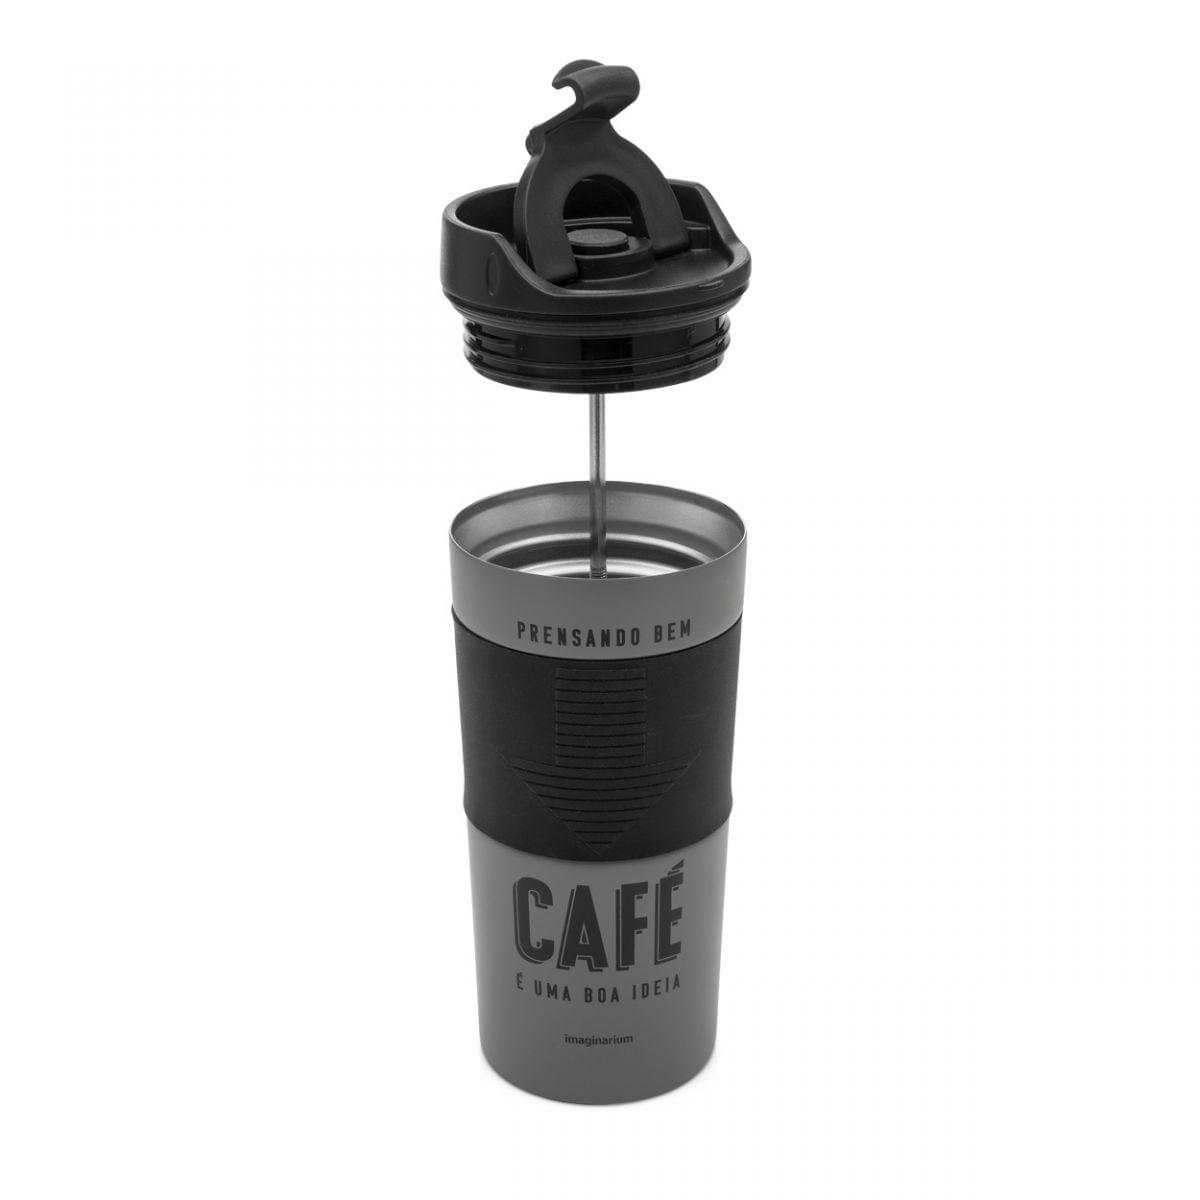 cb686717bd322b Copo prensa francesa cafe boa ideia